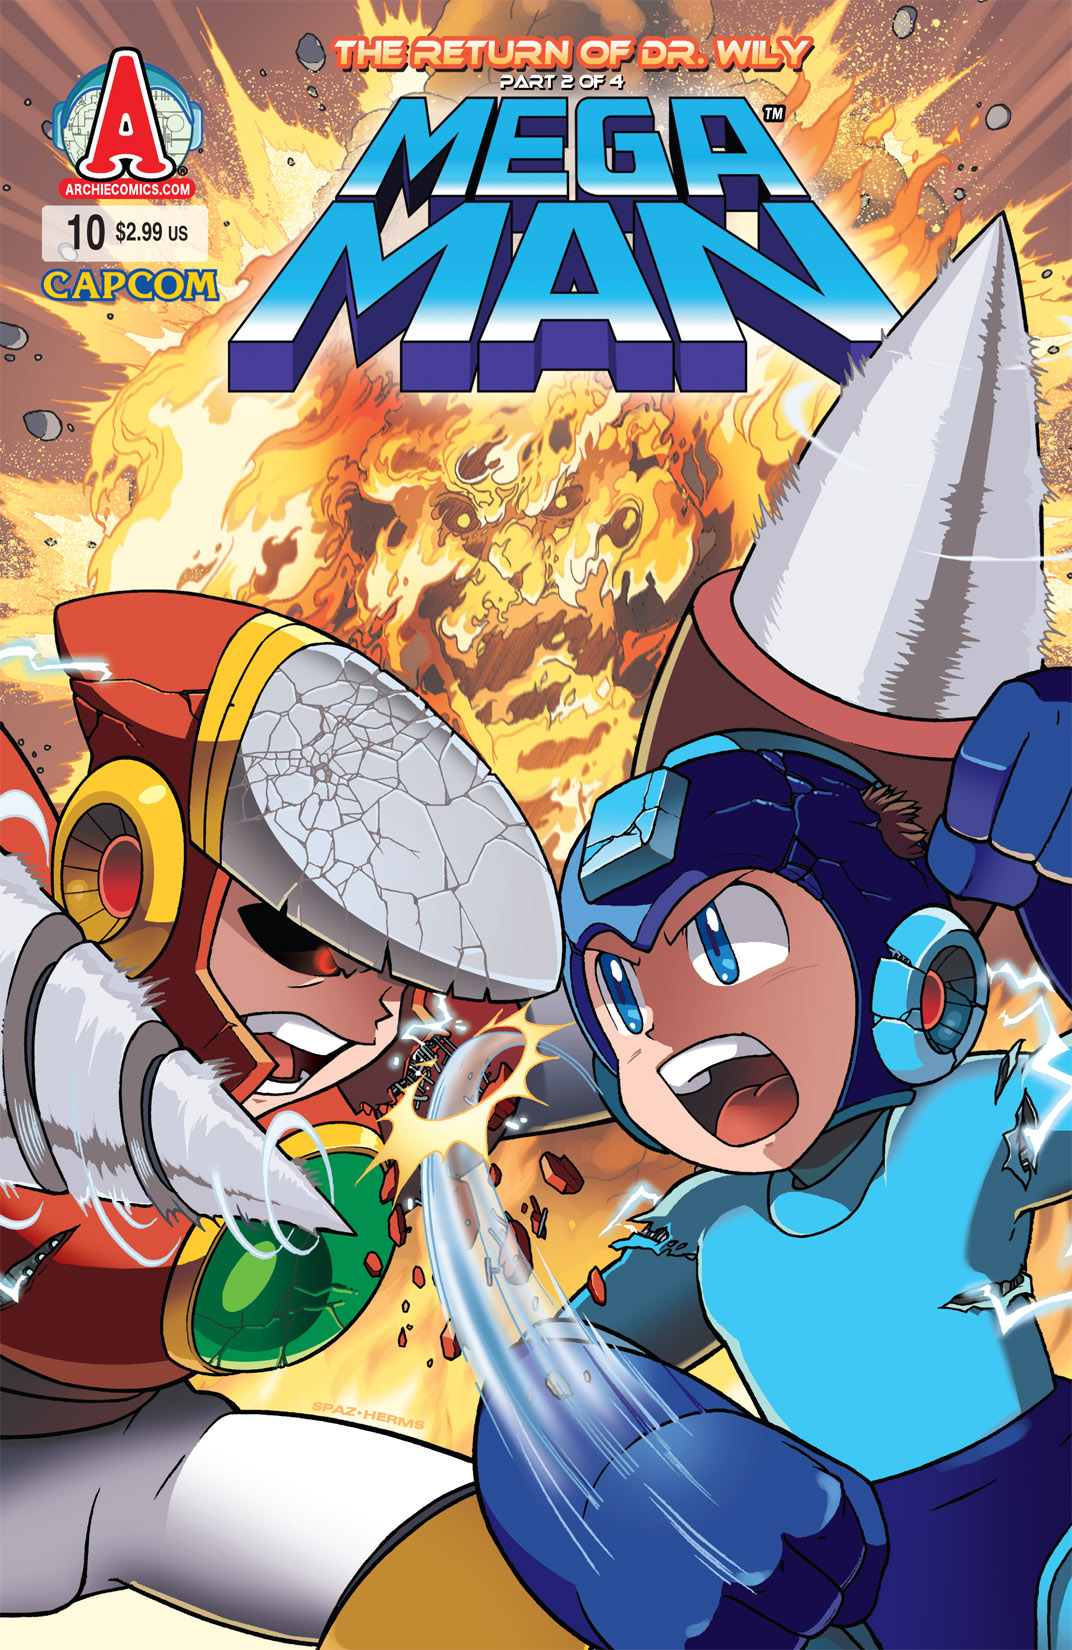 Mega Man Issue 10 (Archie Comics) | MMKB | Fandom powered ... Sabrina The Animated Series Zelda